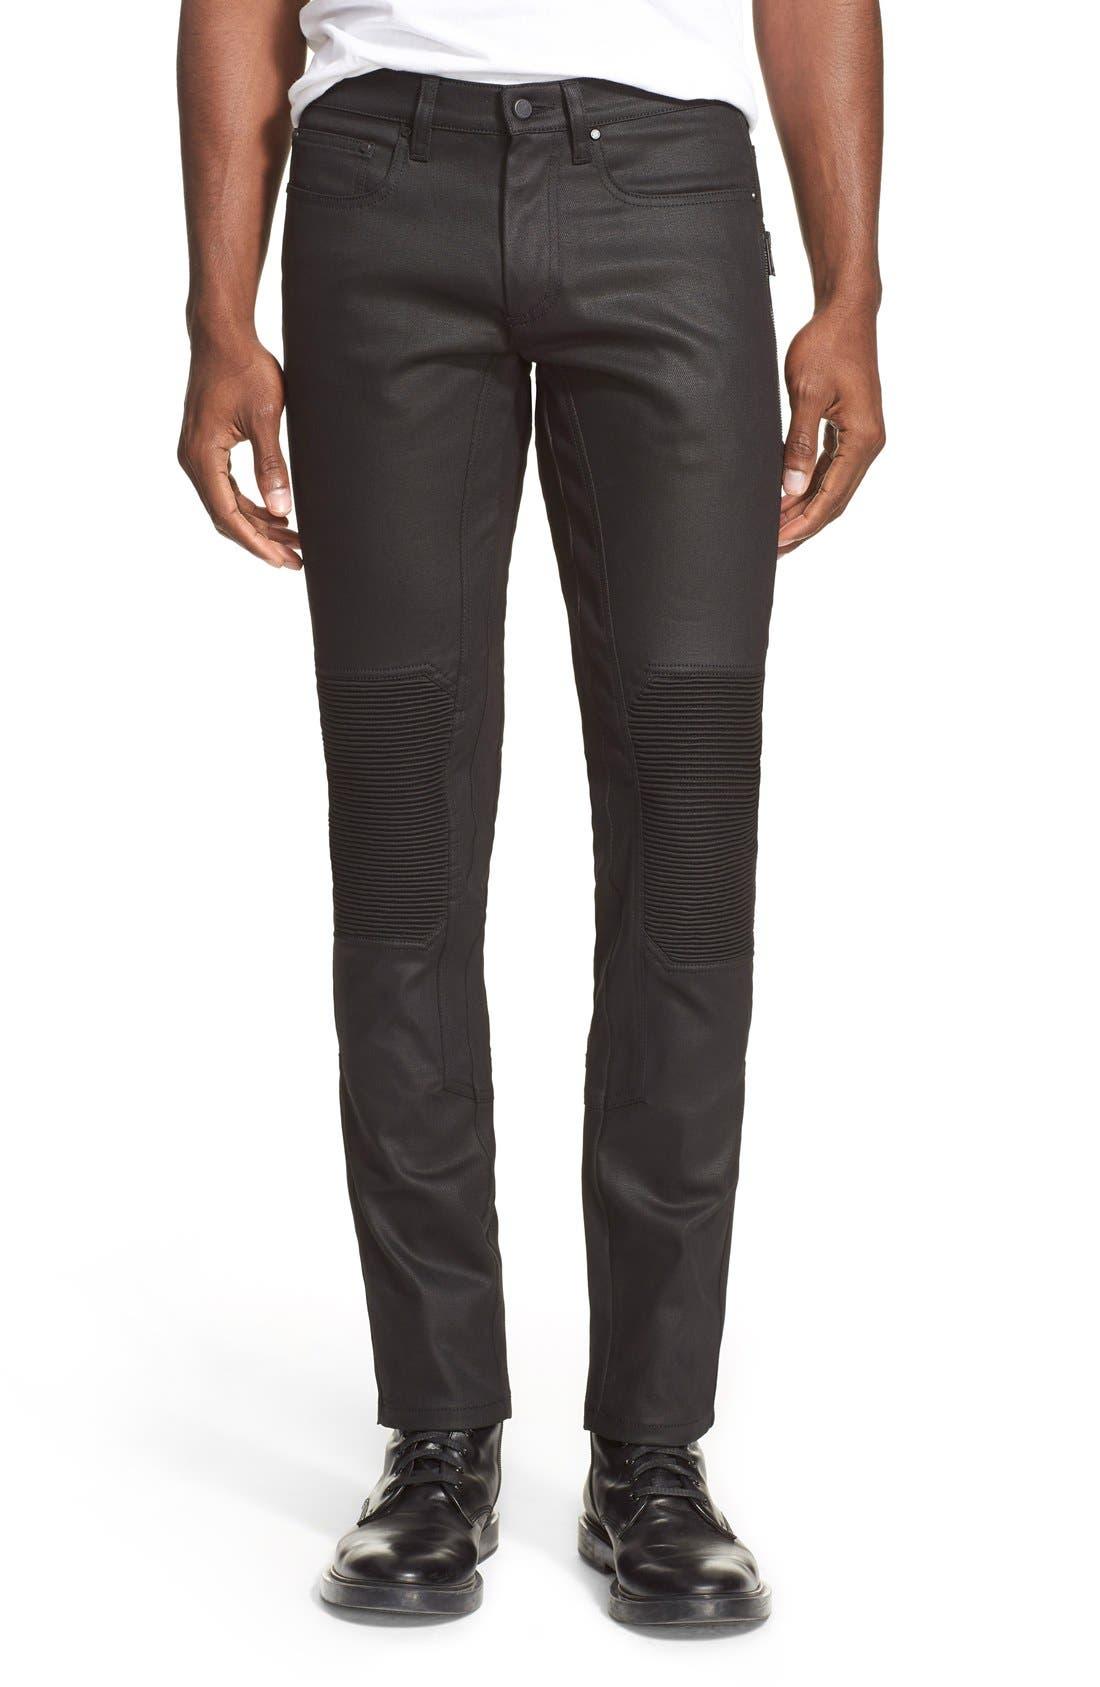 Alternate Image 1 Selected - Belstaff 'Blackrod' Raw Stretch Denim Moto Jeans